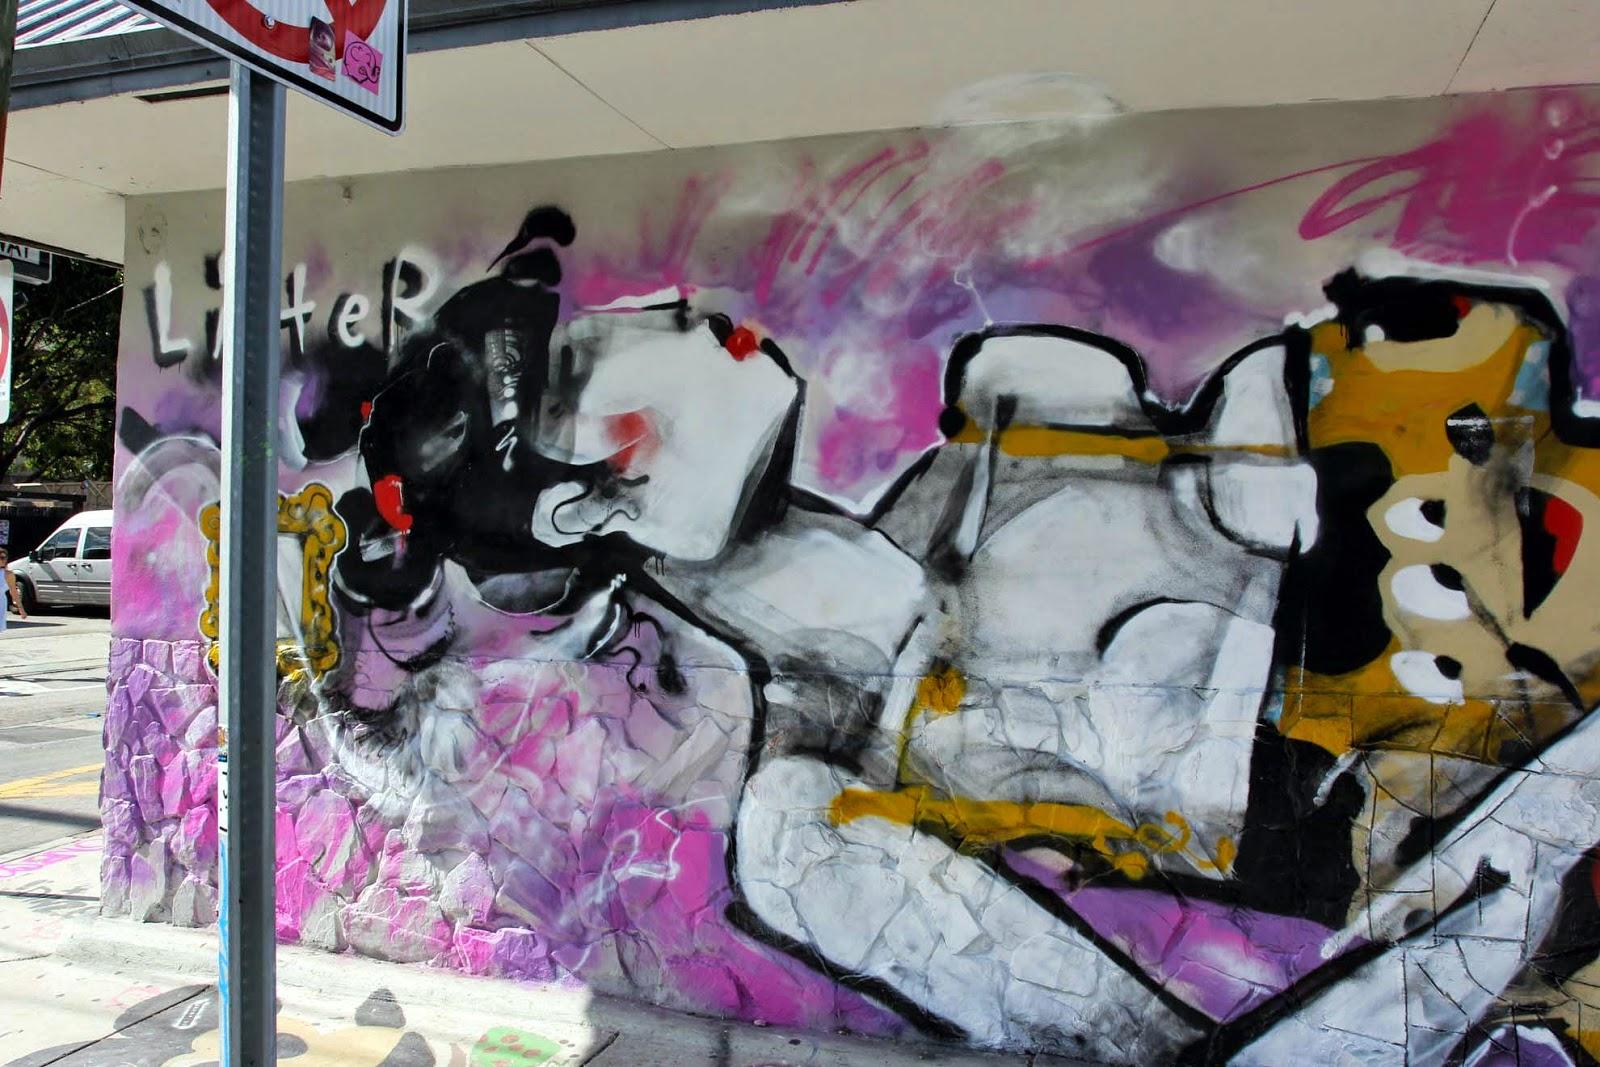 anthony-lister-new-mural-at-art-basel-2014-03